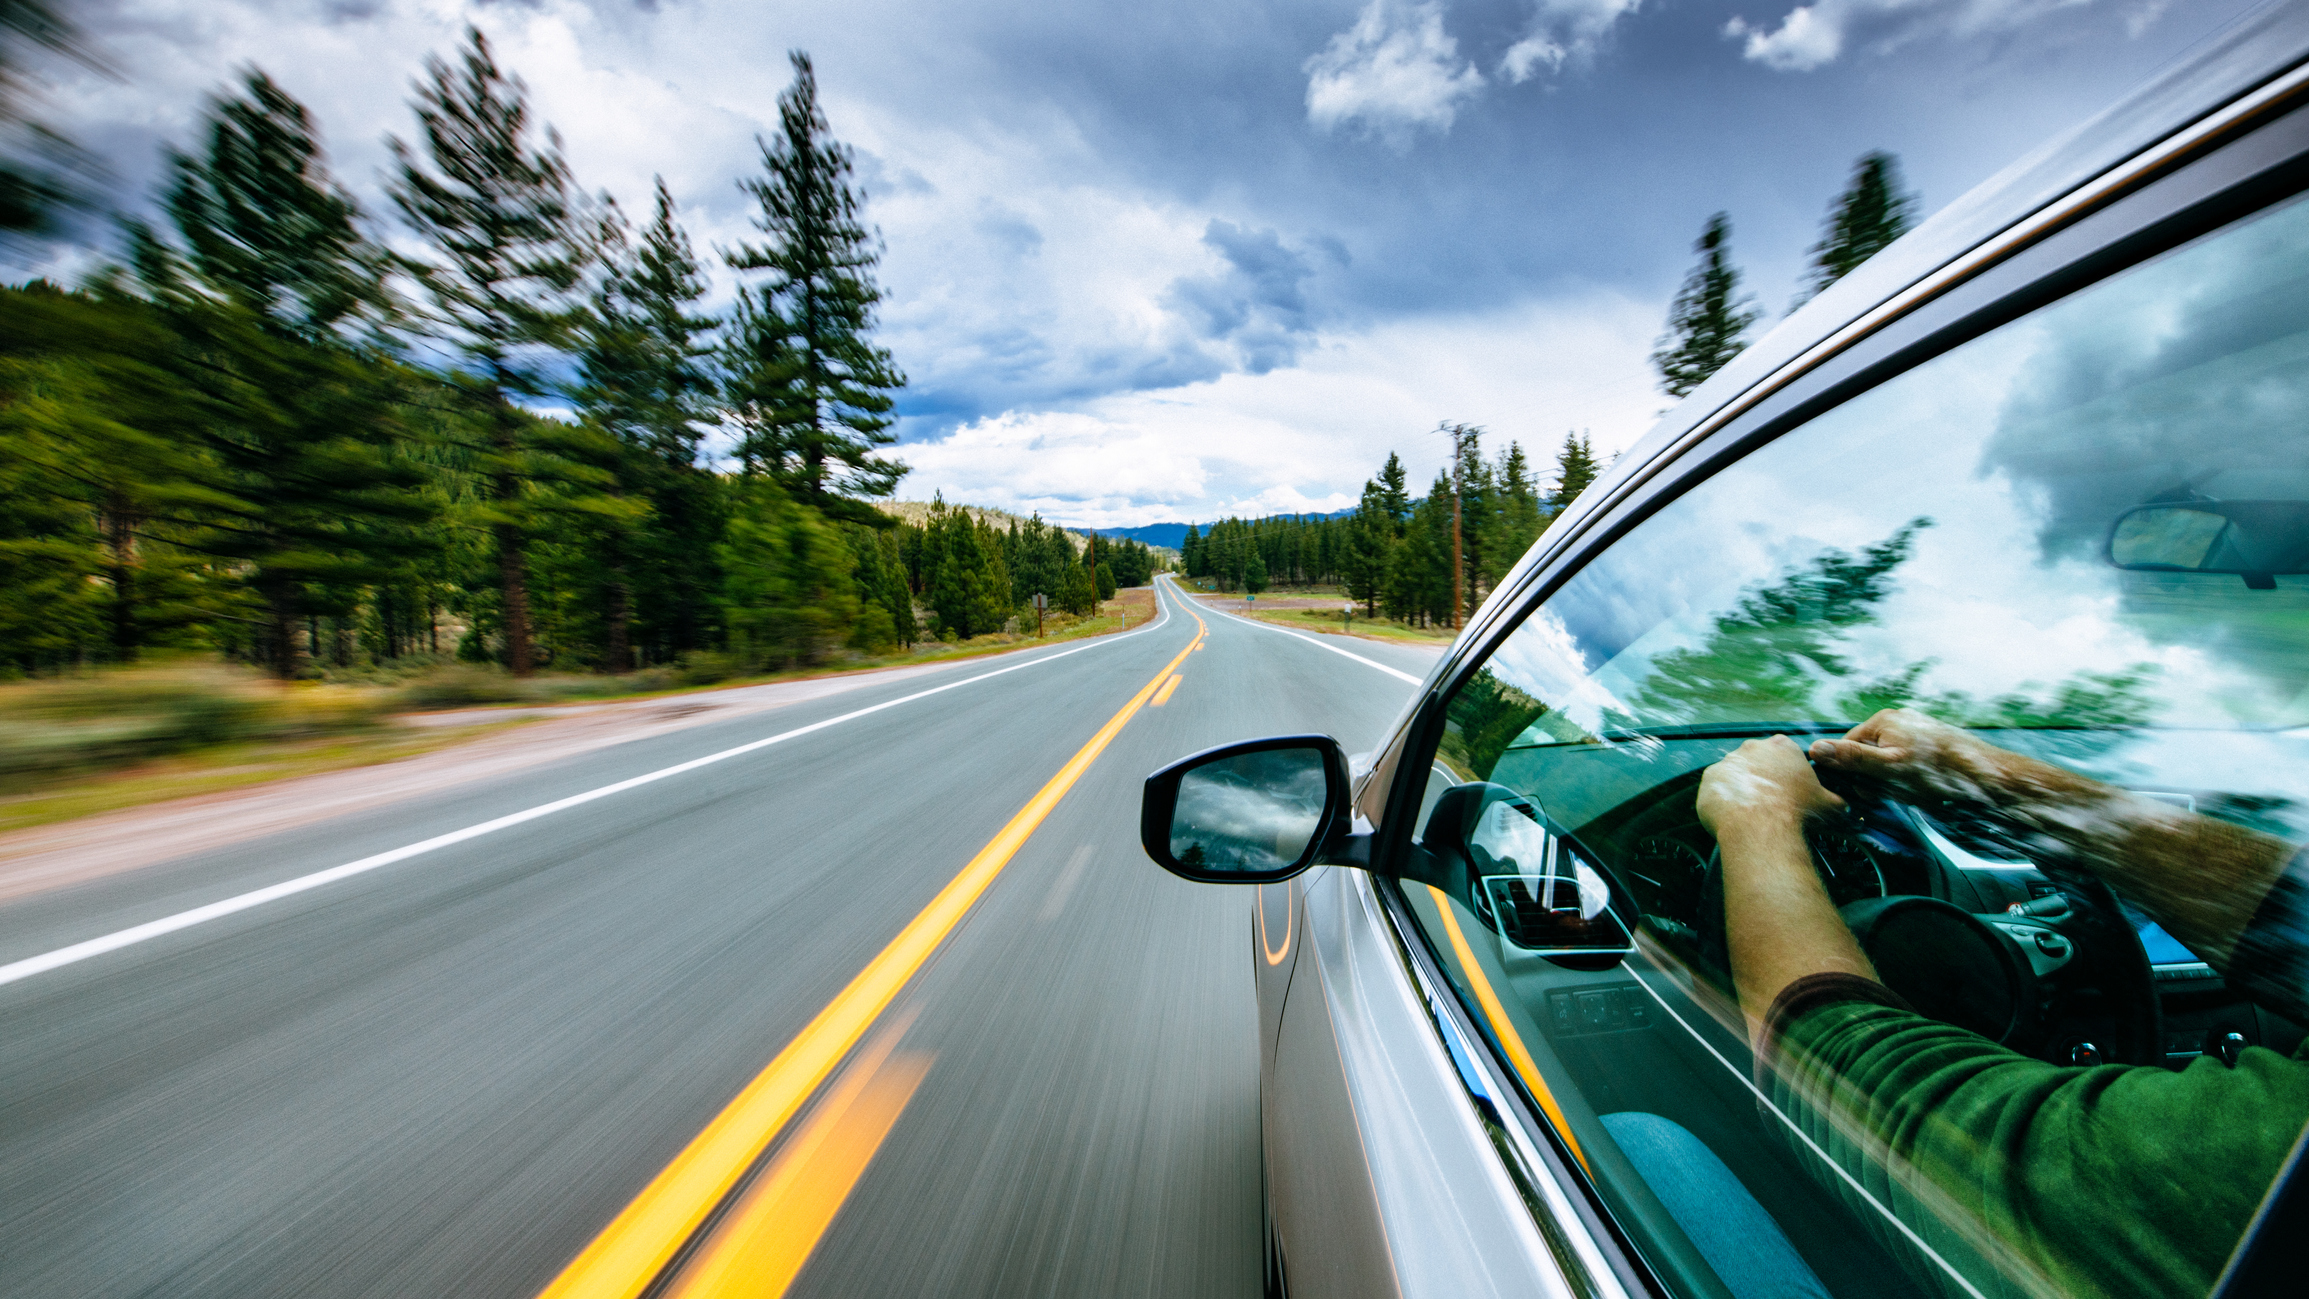 iStock画像 車と景色